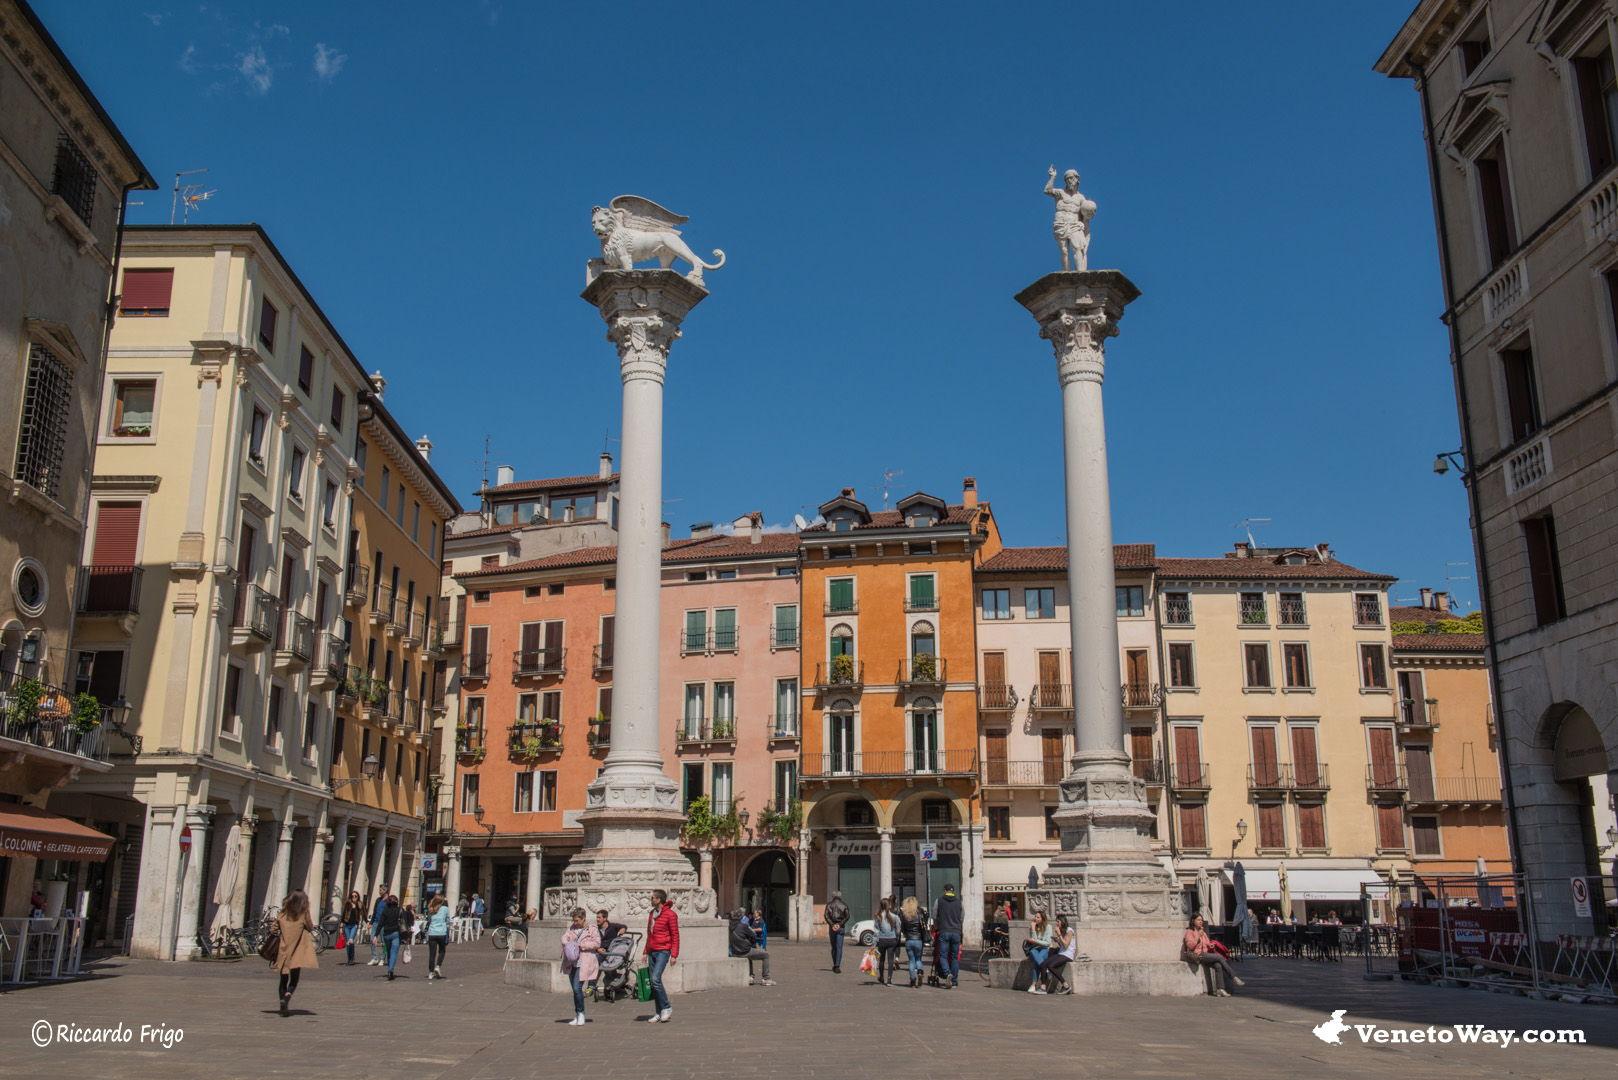 Le Piazze di Vicenza